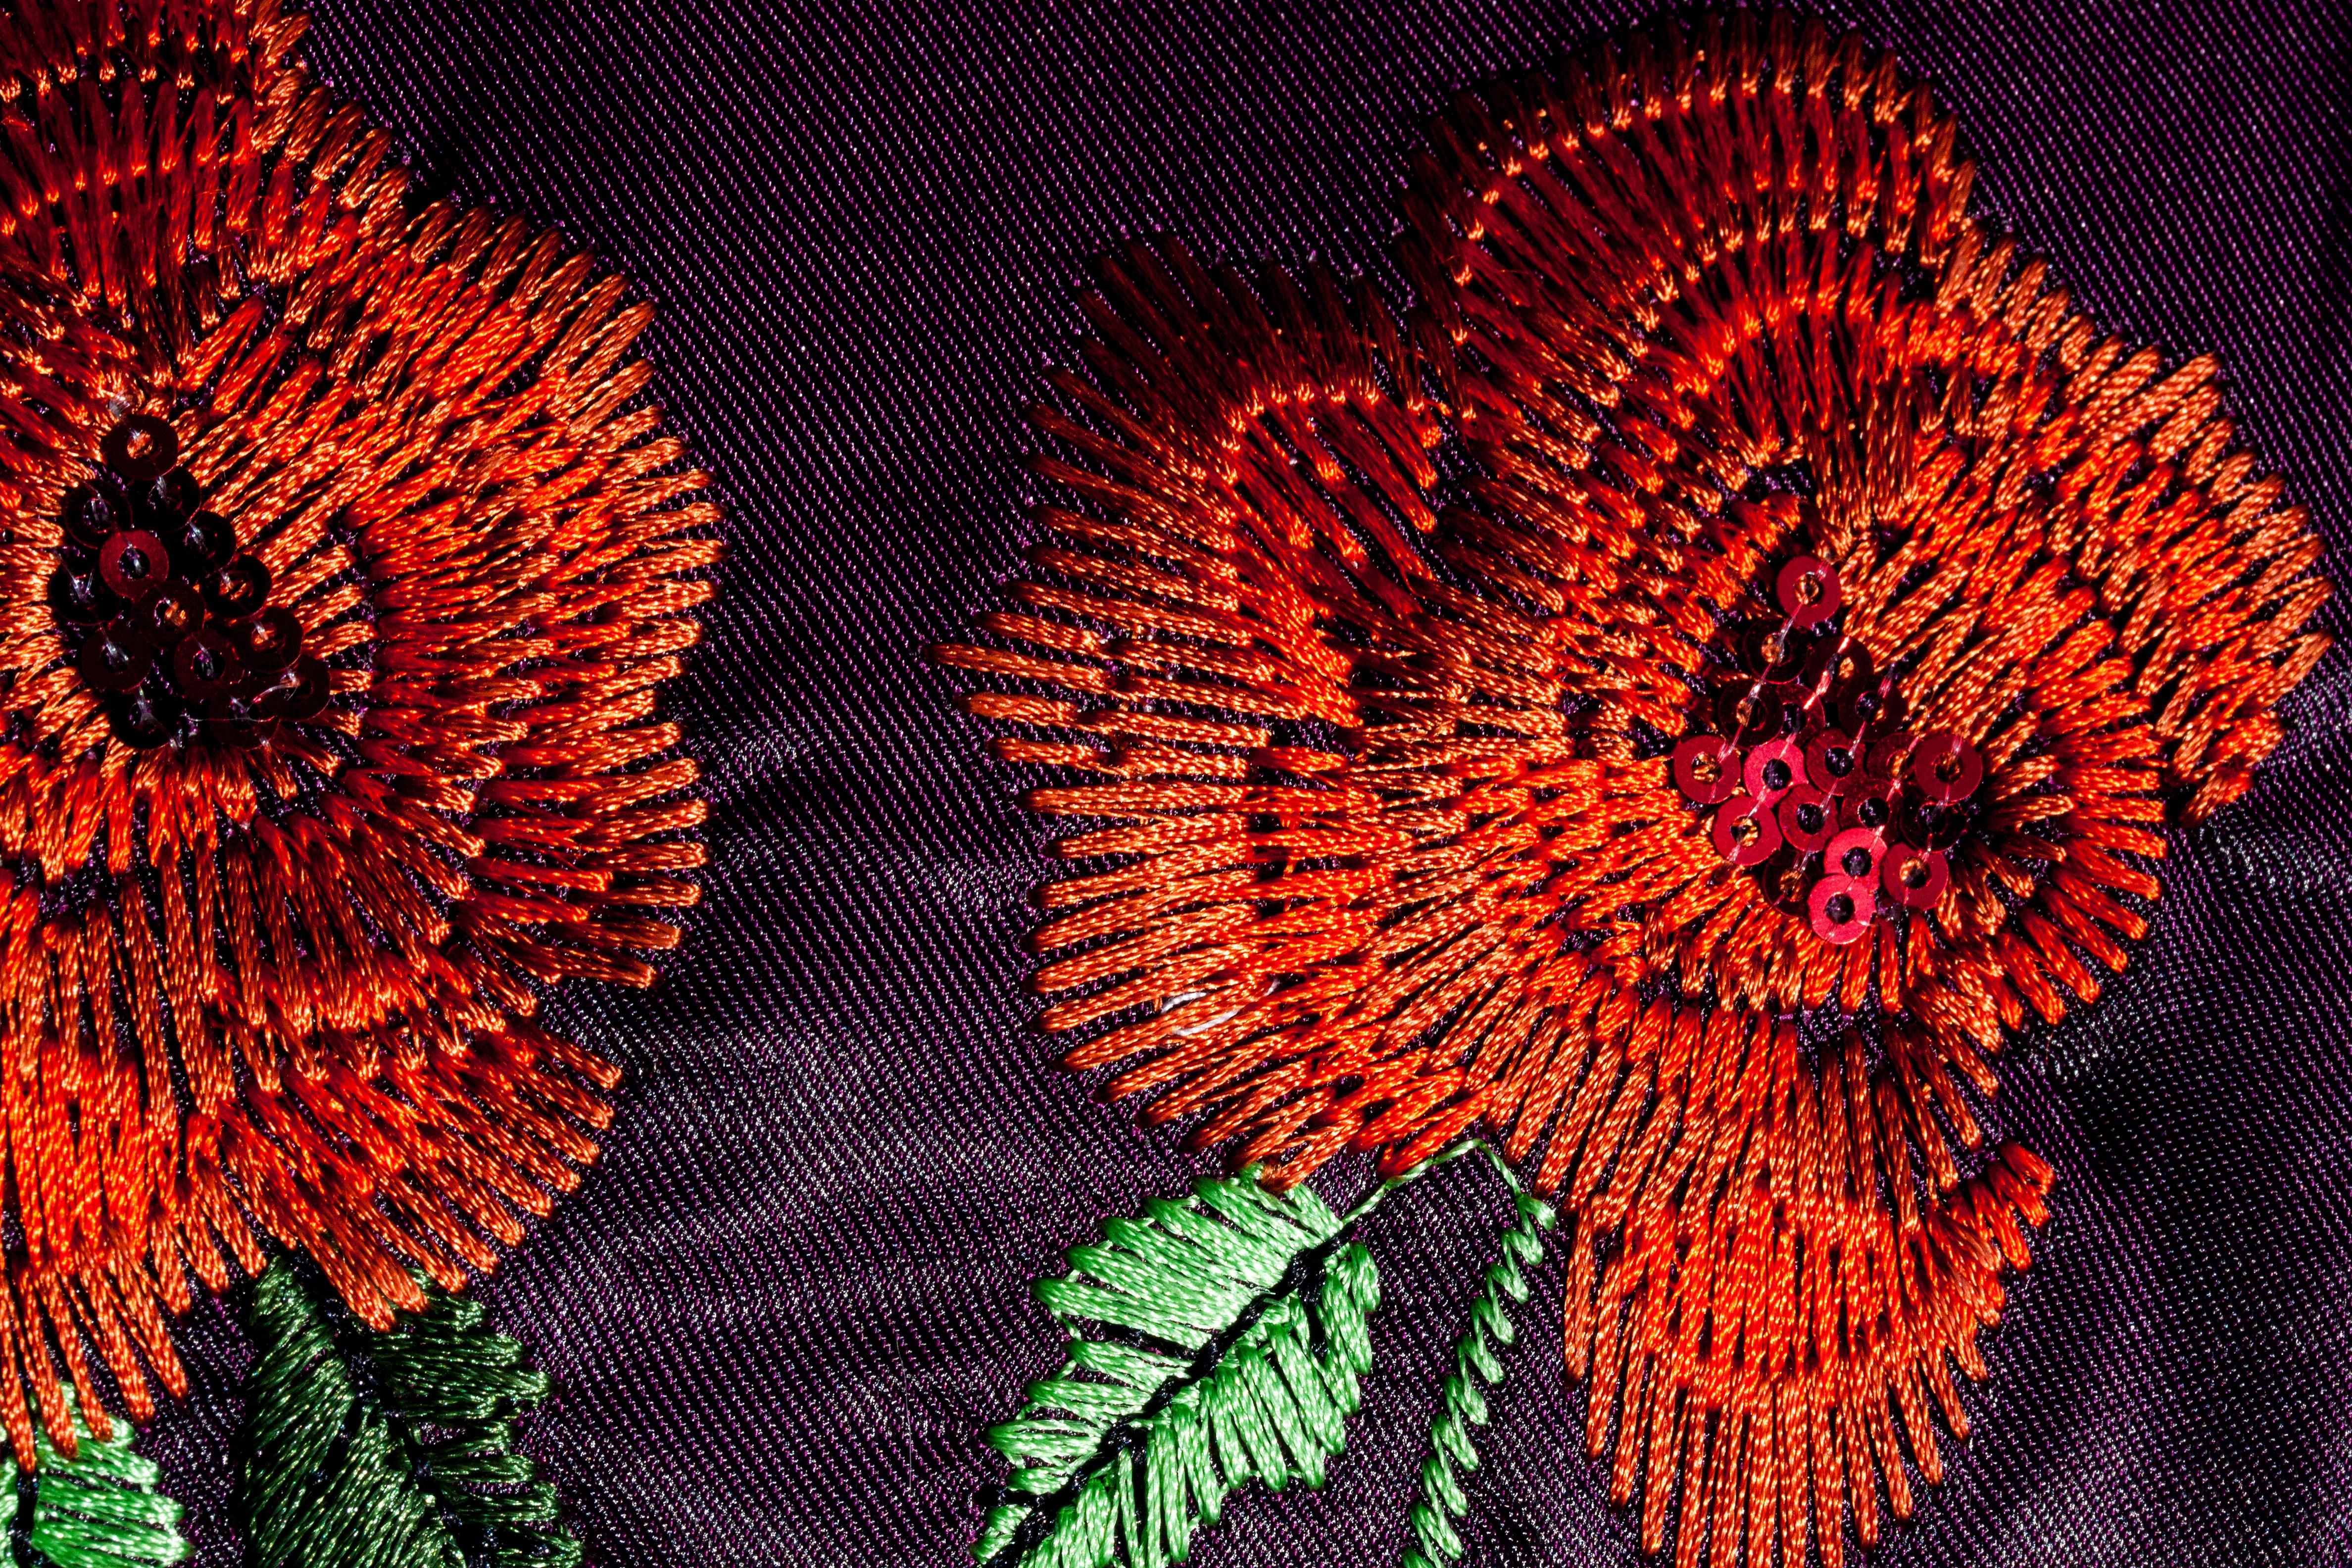 Fotos gratis : hoja, flor, naranja, patrón, rojo, color, flora ...